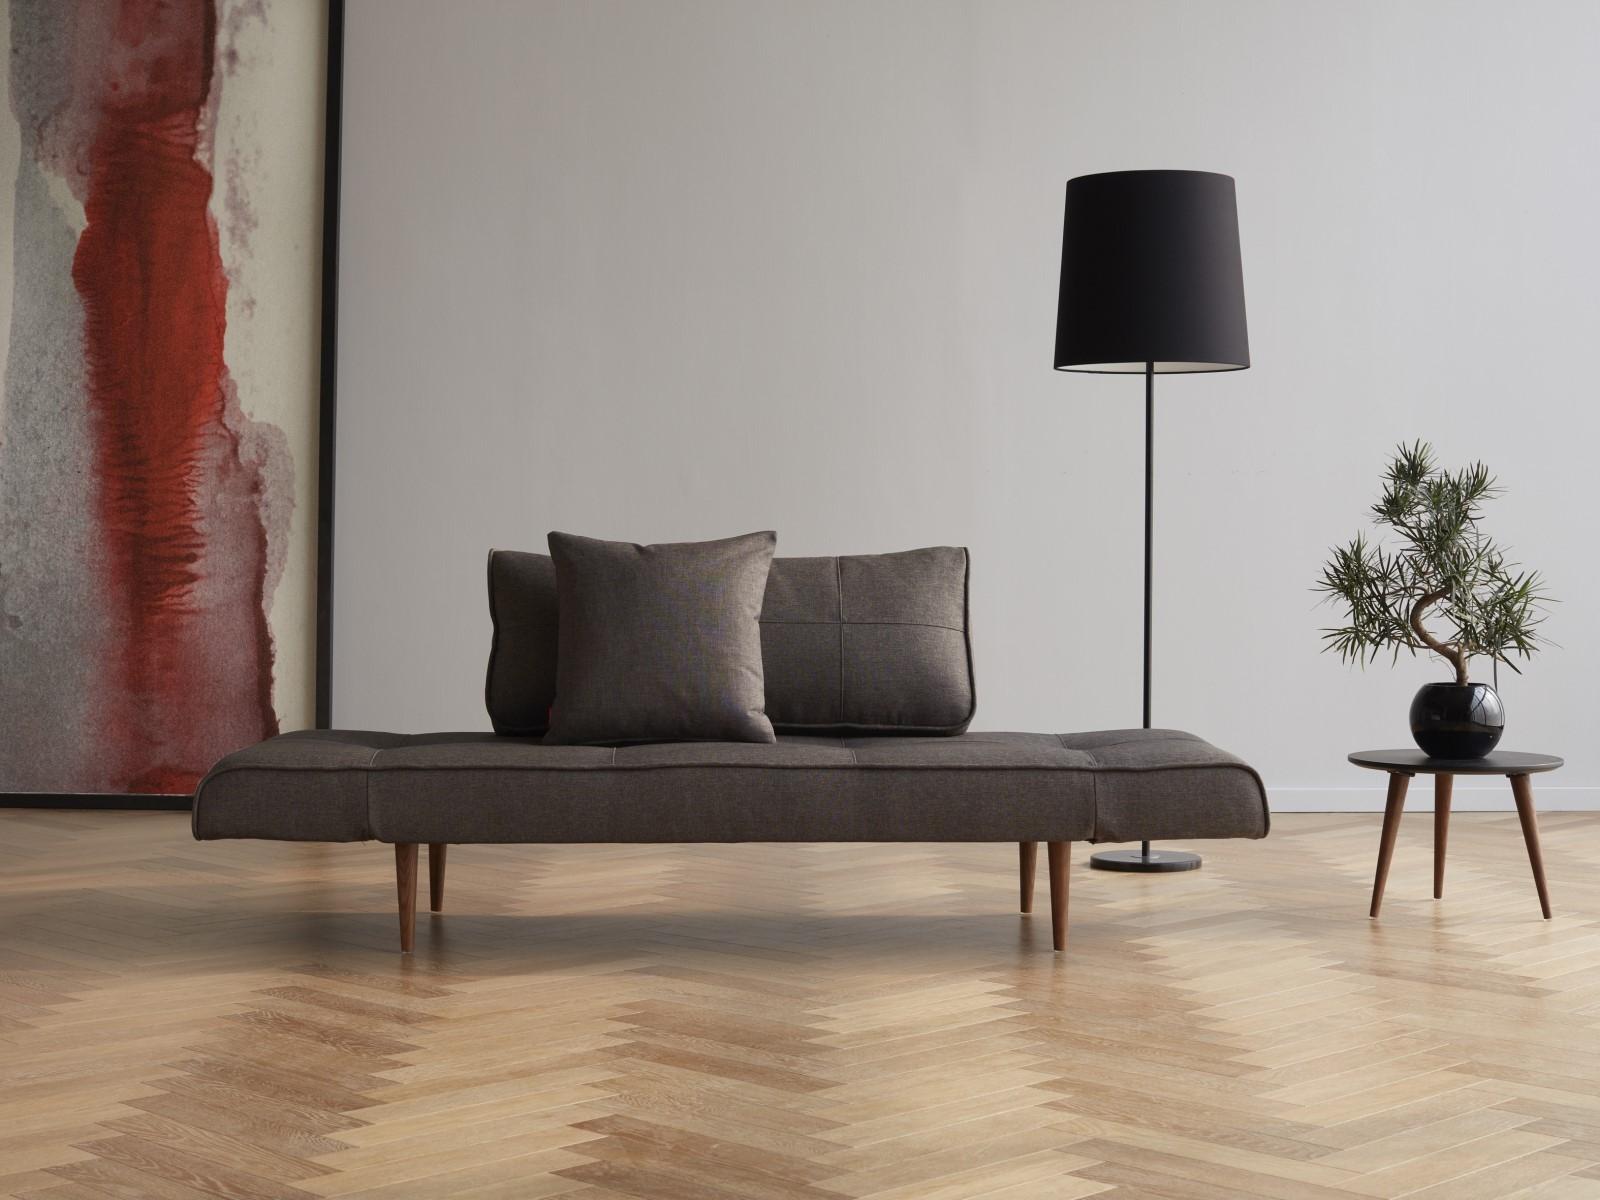 Kanapee Sofa innovation zeal sofa innoshop